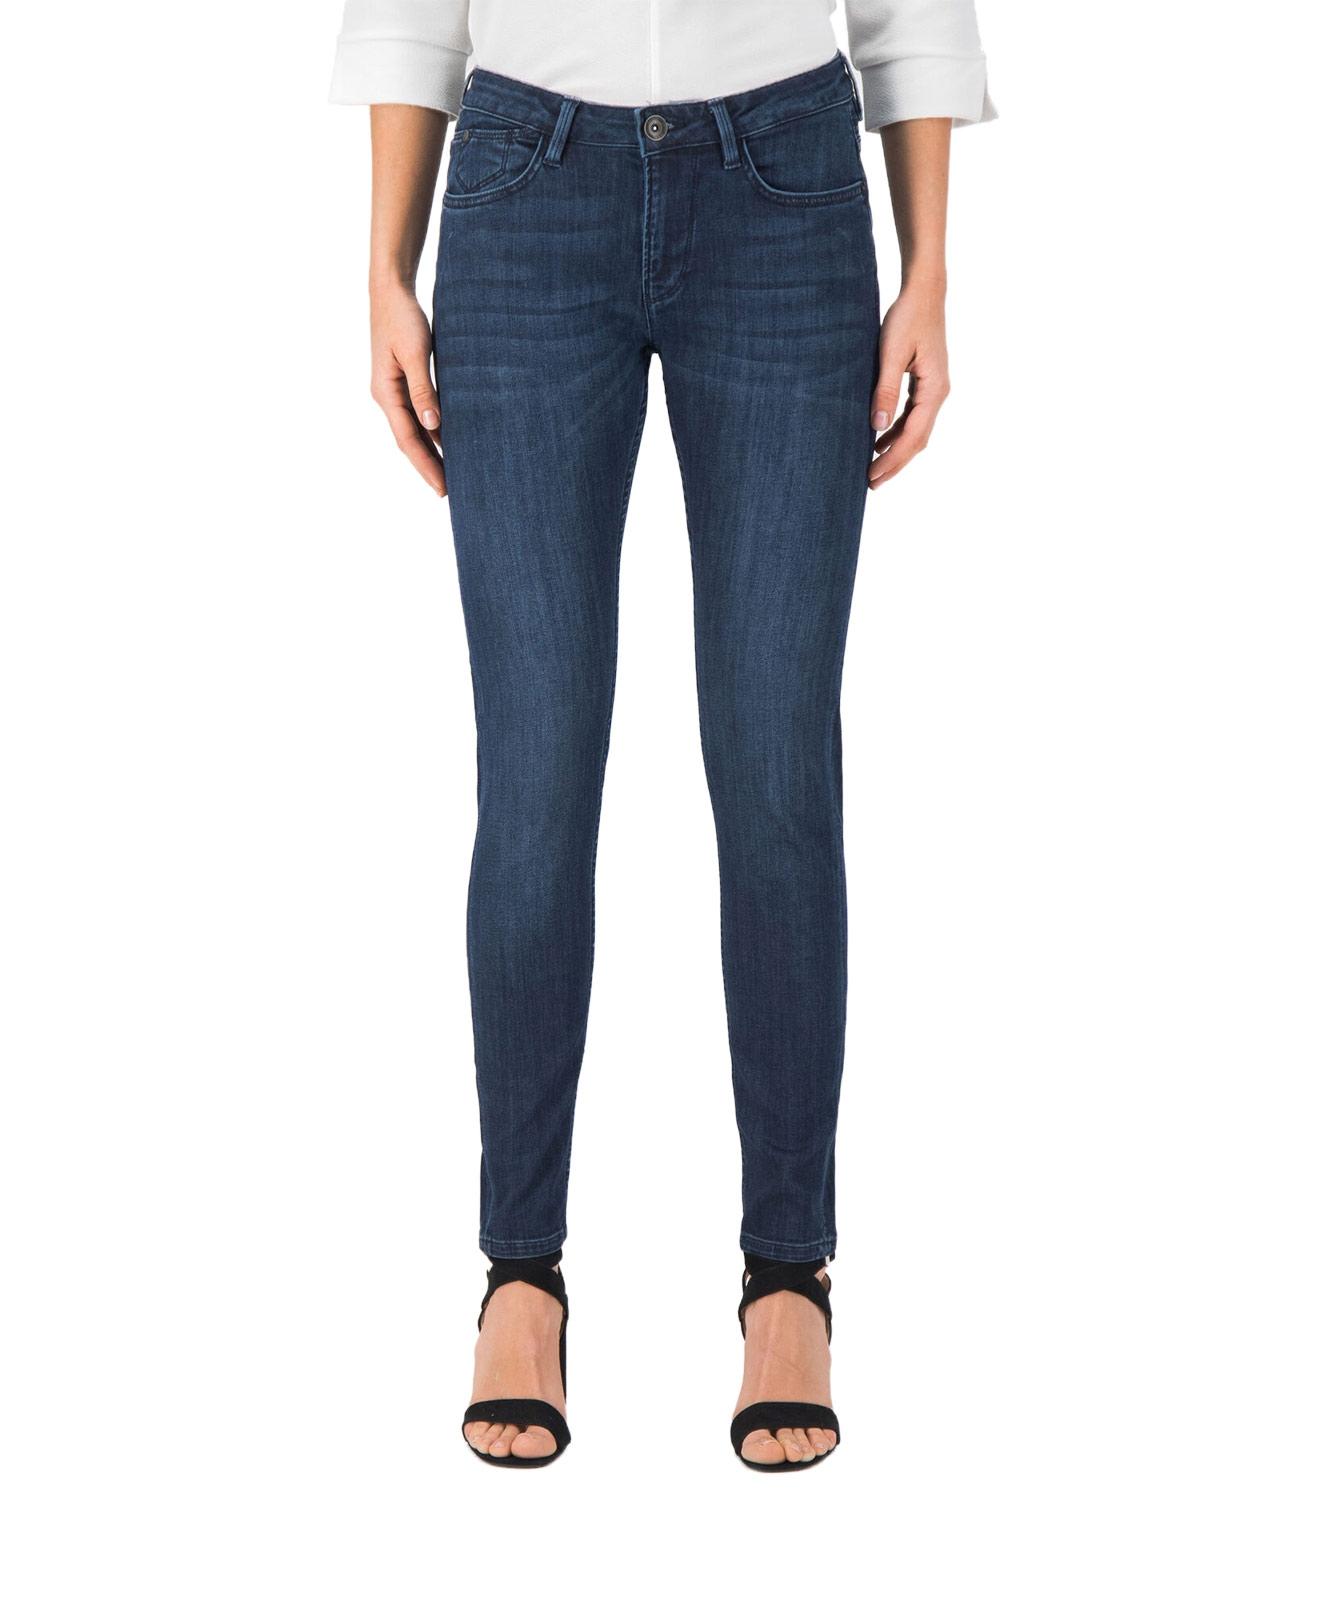 Hosen - Garcia Slim Fit Jeans Rachelle in Dark Used  - Onlineshop Jeans Meile